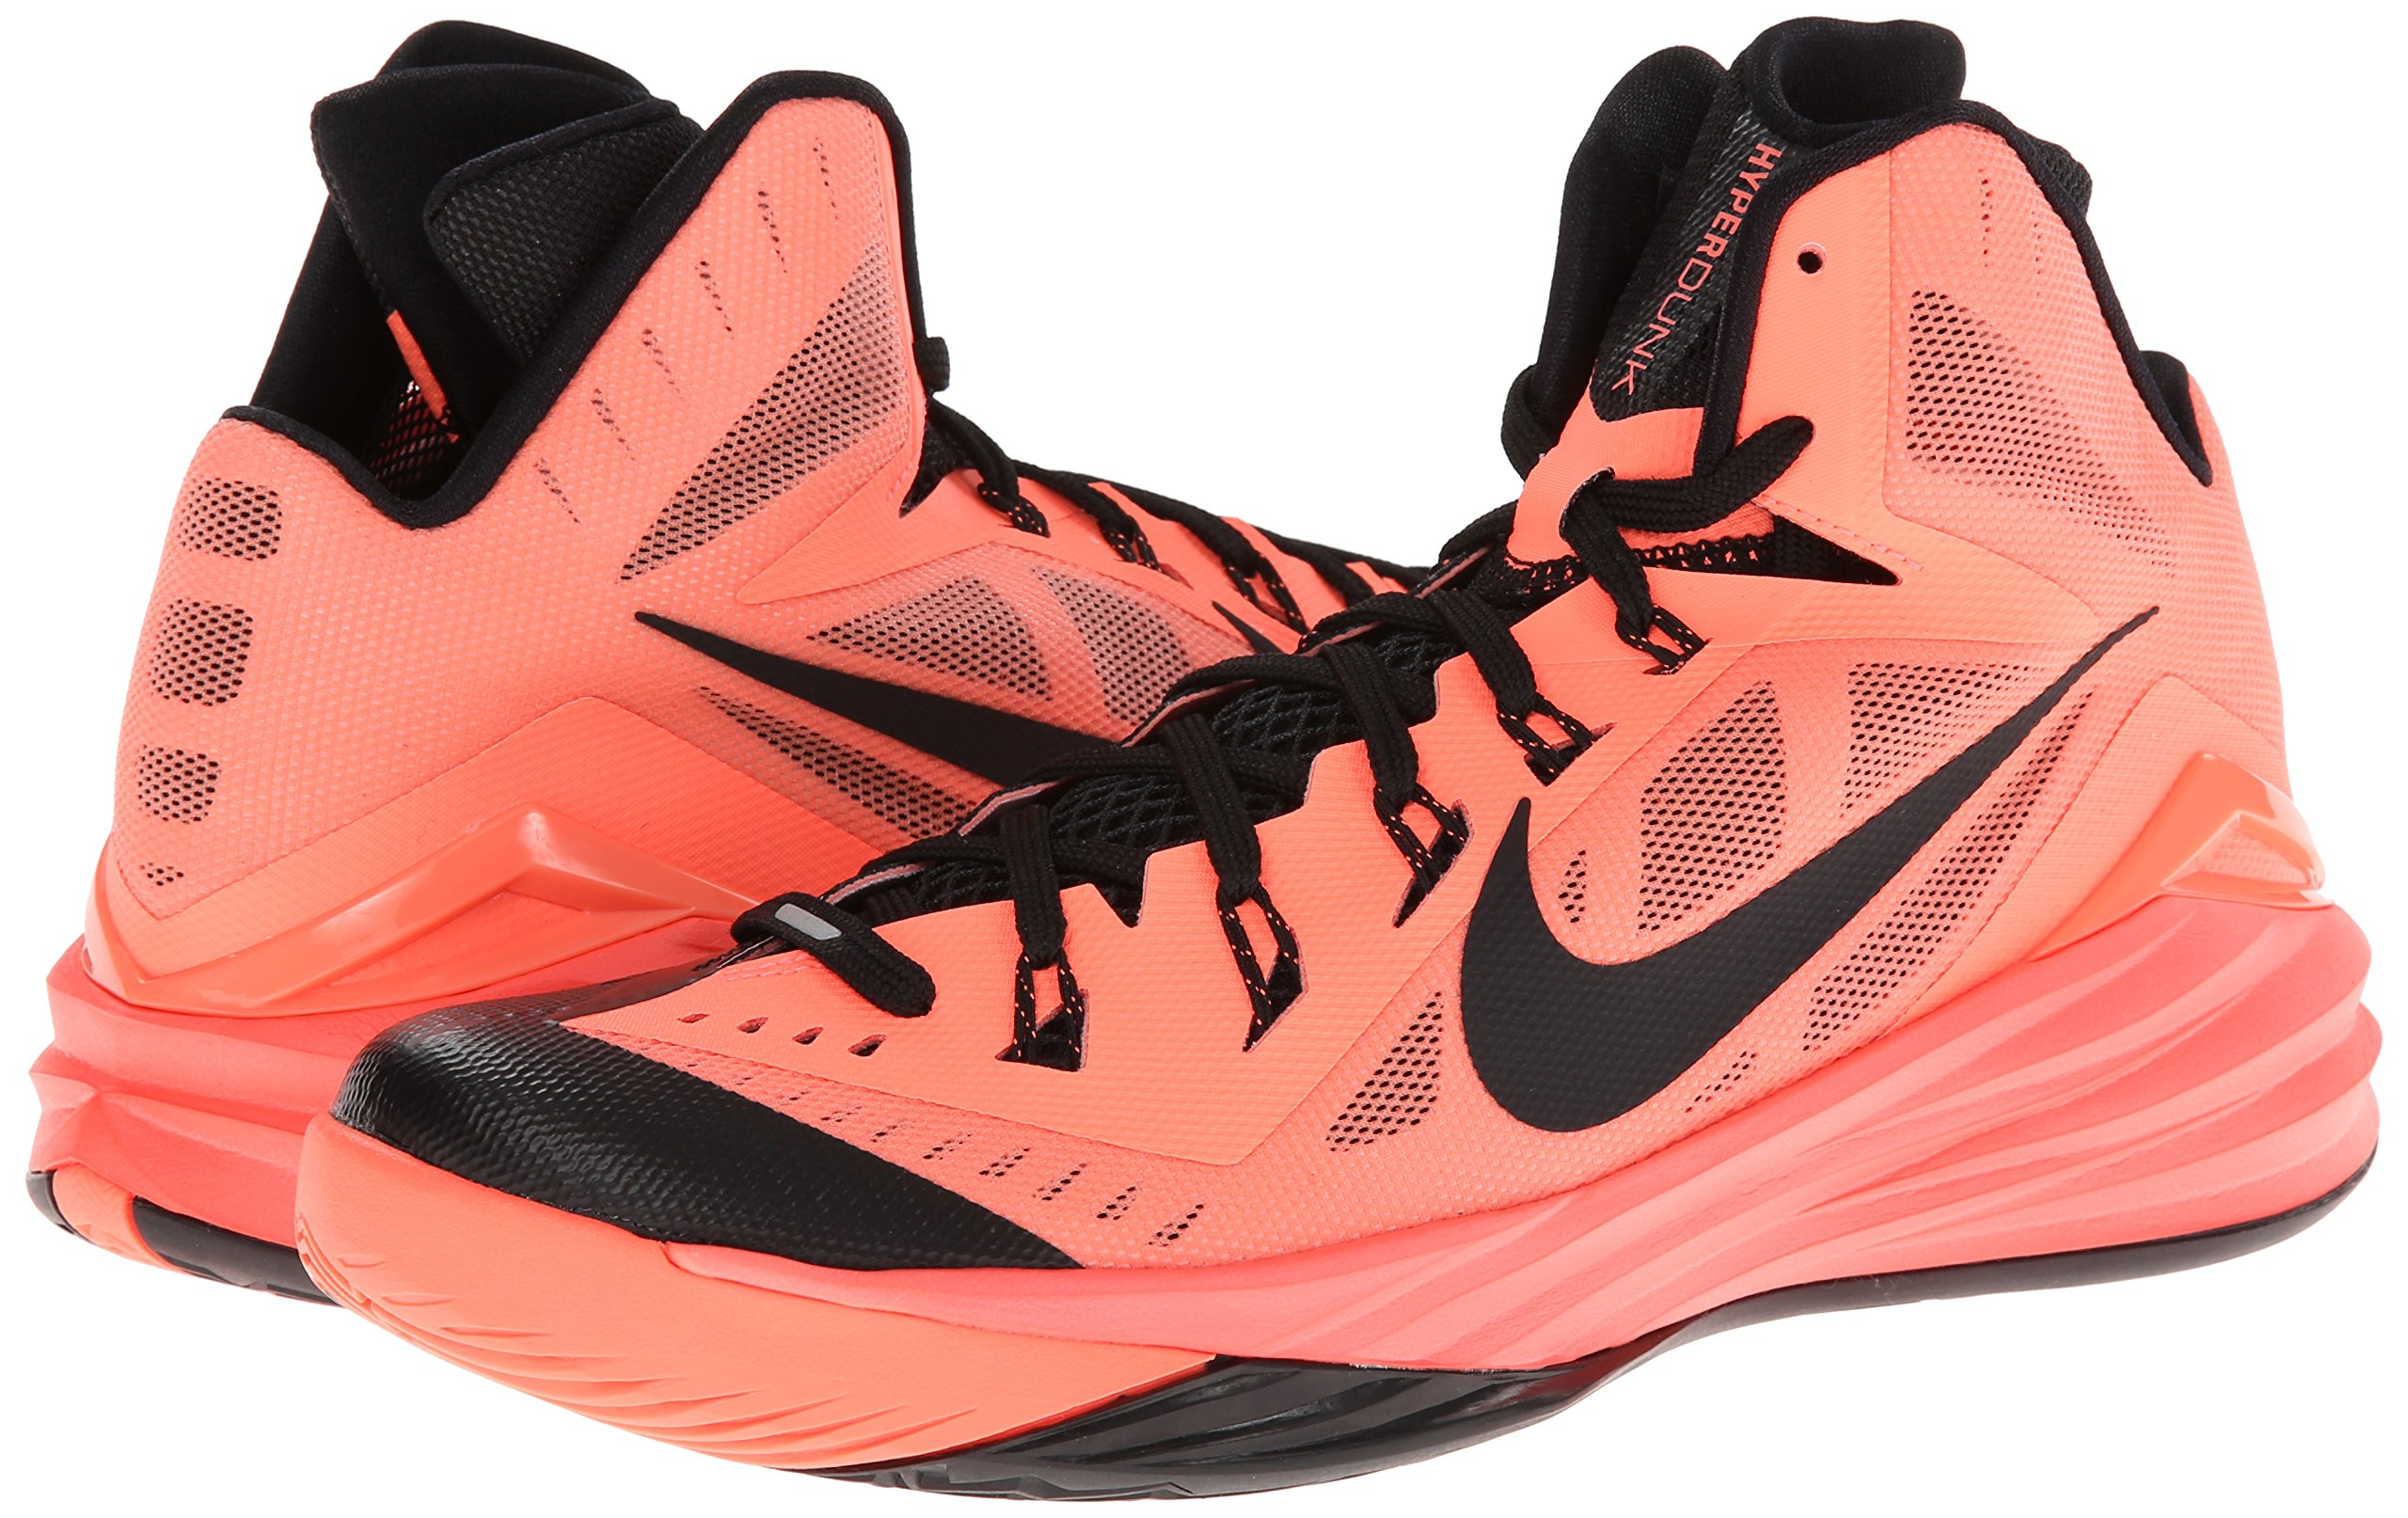 47479c1ef8a6 Galleon - Nike Men s Hyperdunk 2014 Bright Mango Black Basketball Shoe 10.5  Men US